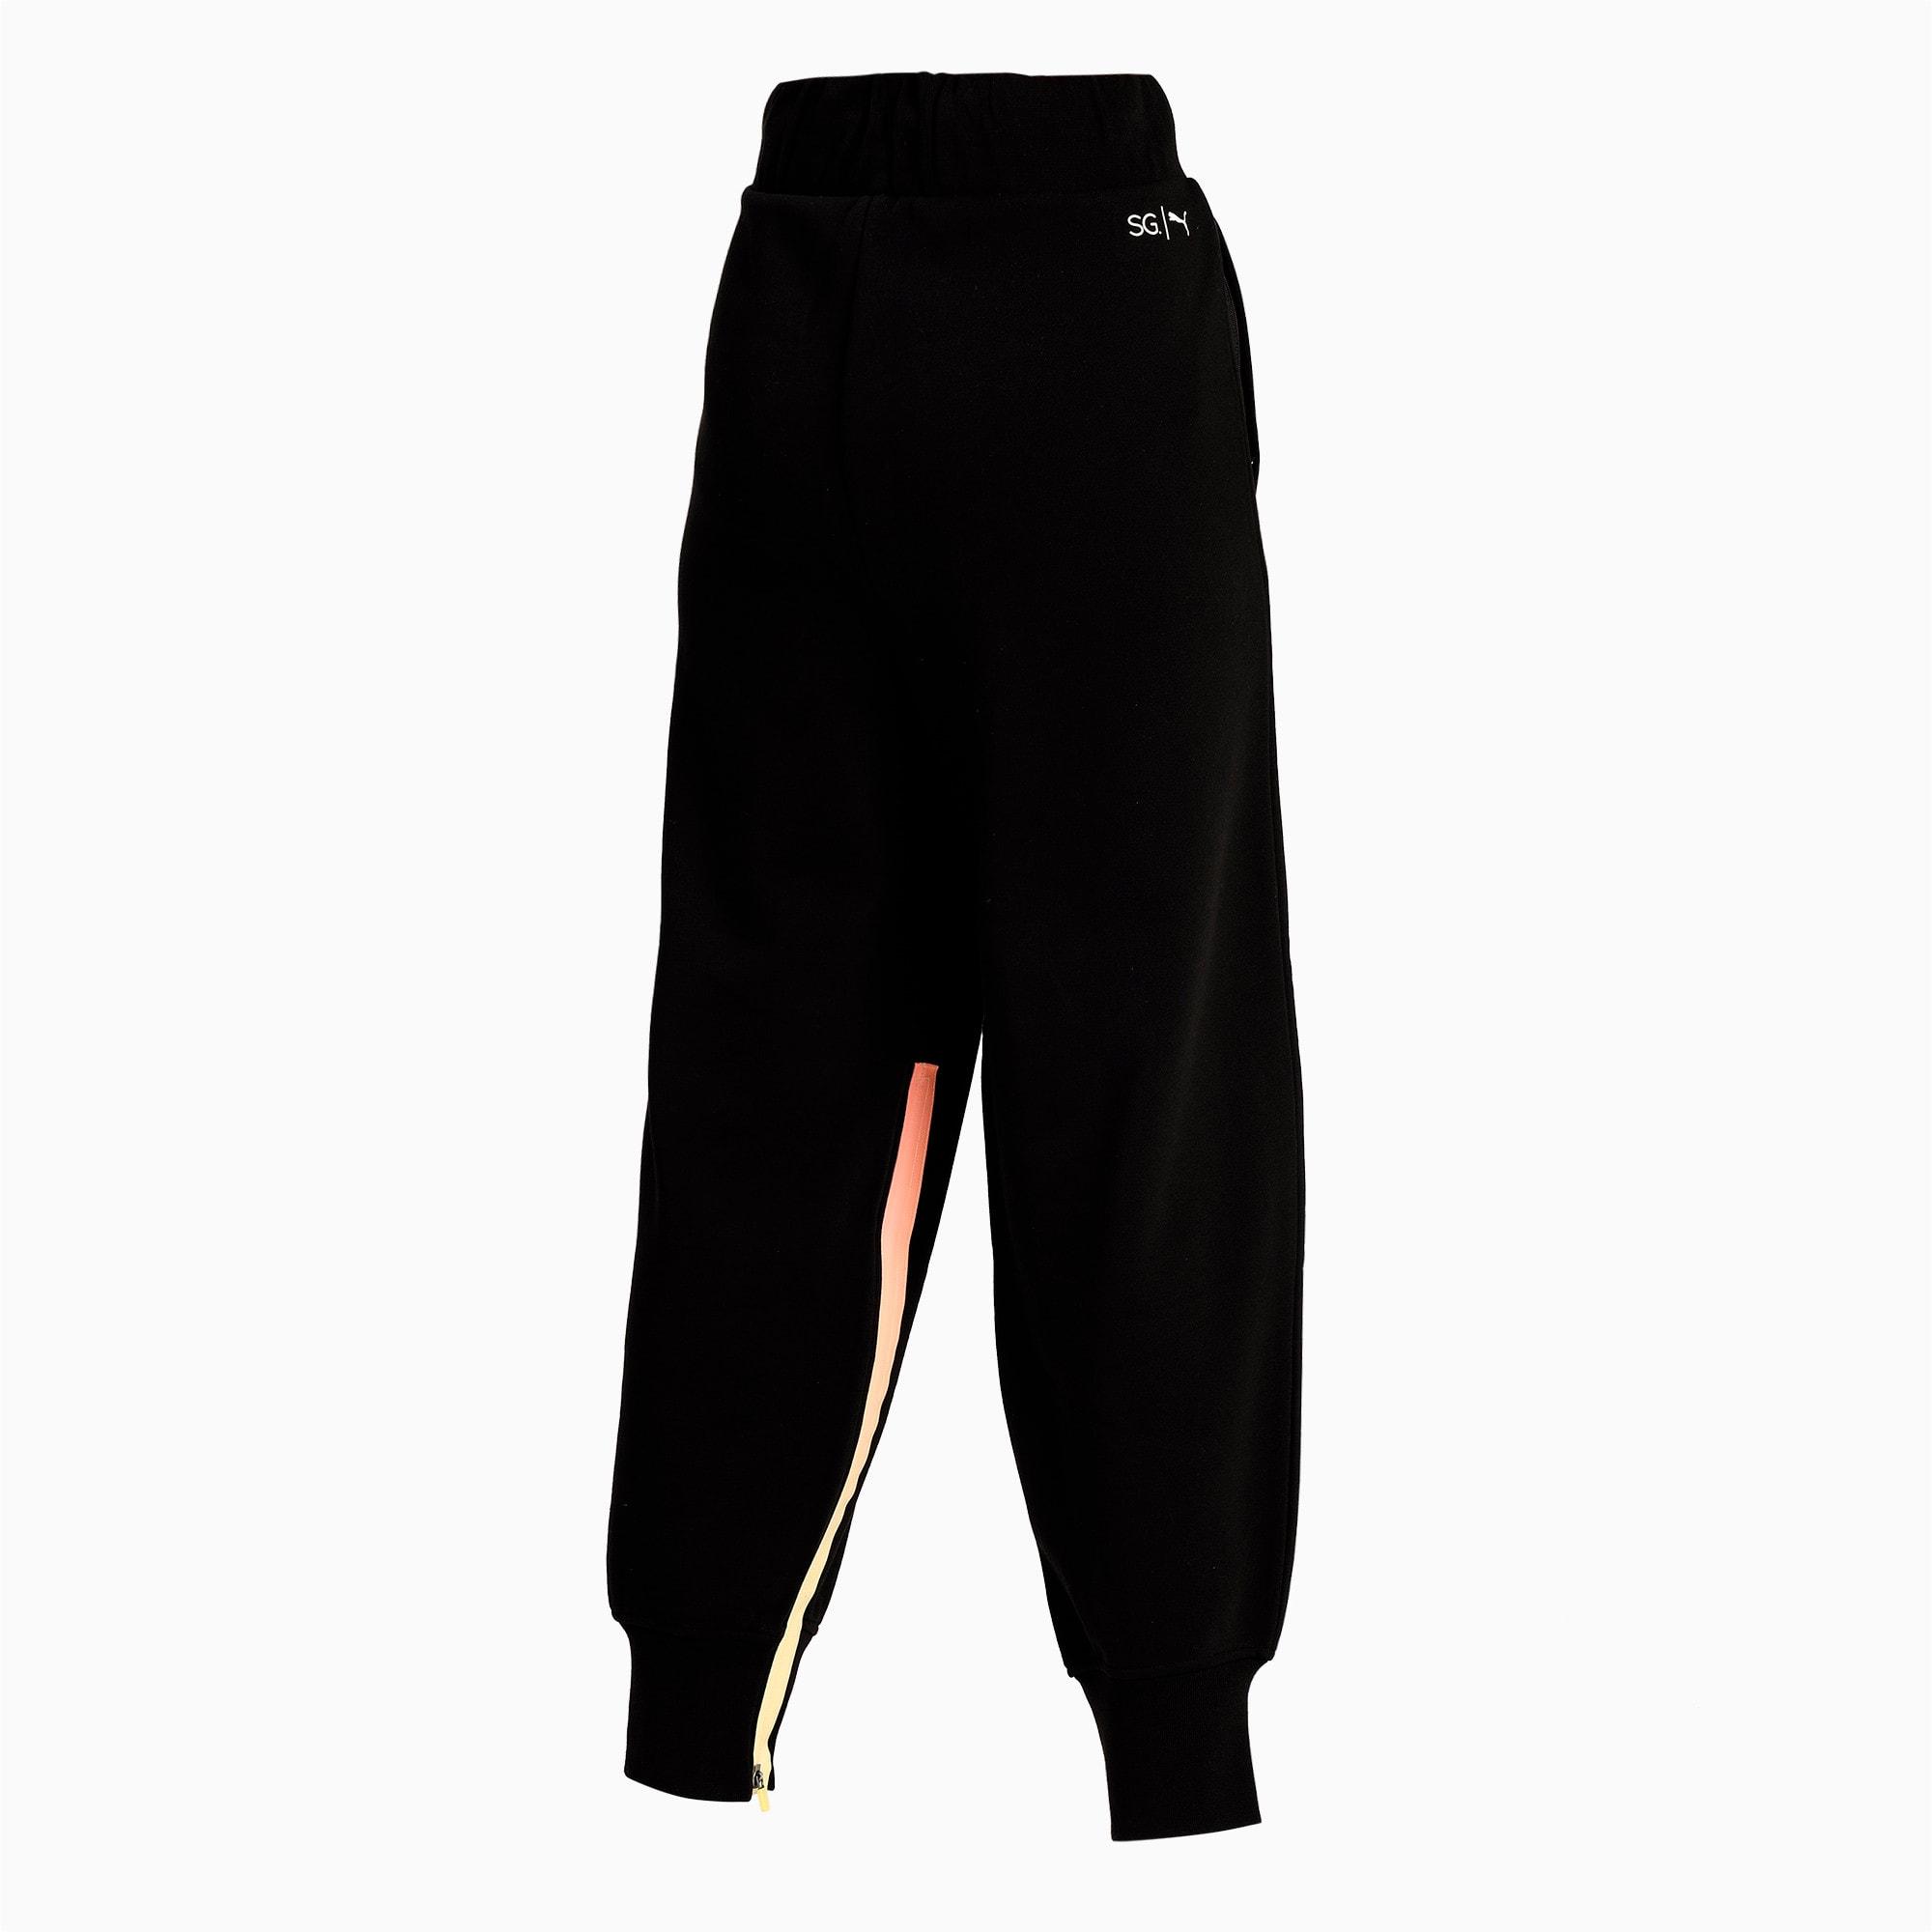 Thumbnail 5 of PUMA x SELENA GOMEZ Women's Sweatpants, Puma Black, medium-IND